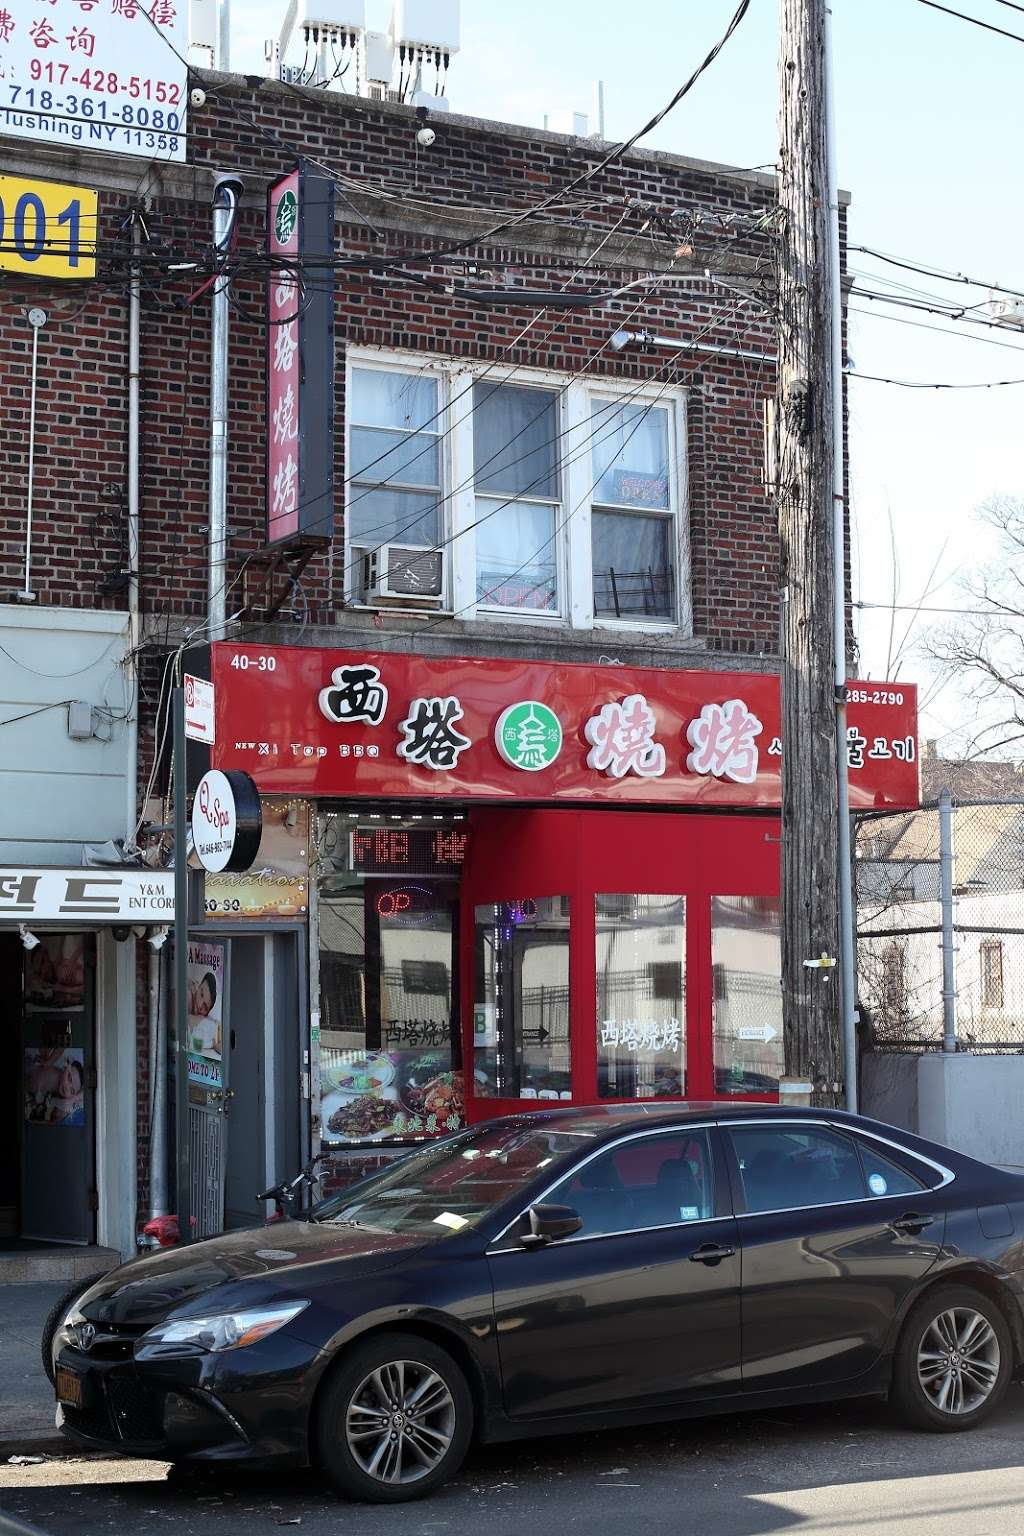 Xi Top BBQ - restaurant  | Photo 2 of 10 | Address: 40-30 149th Pl, Flushing, NY 11354, USA | Phone: (917) 285-2790